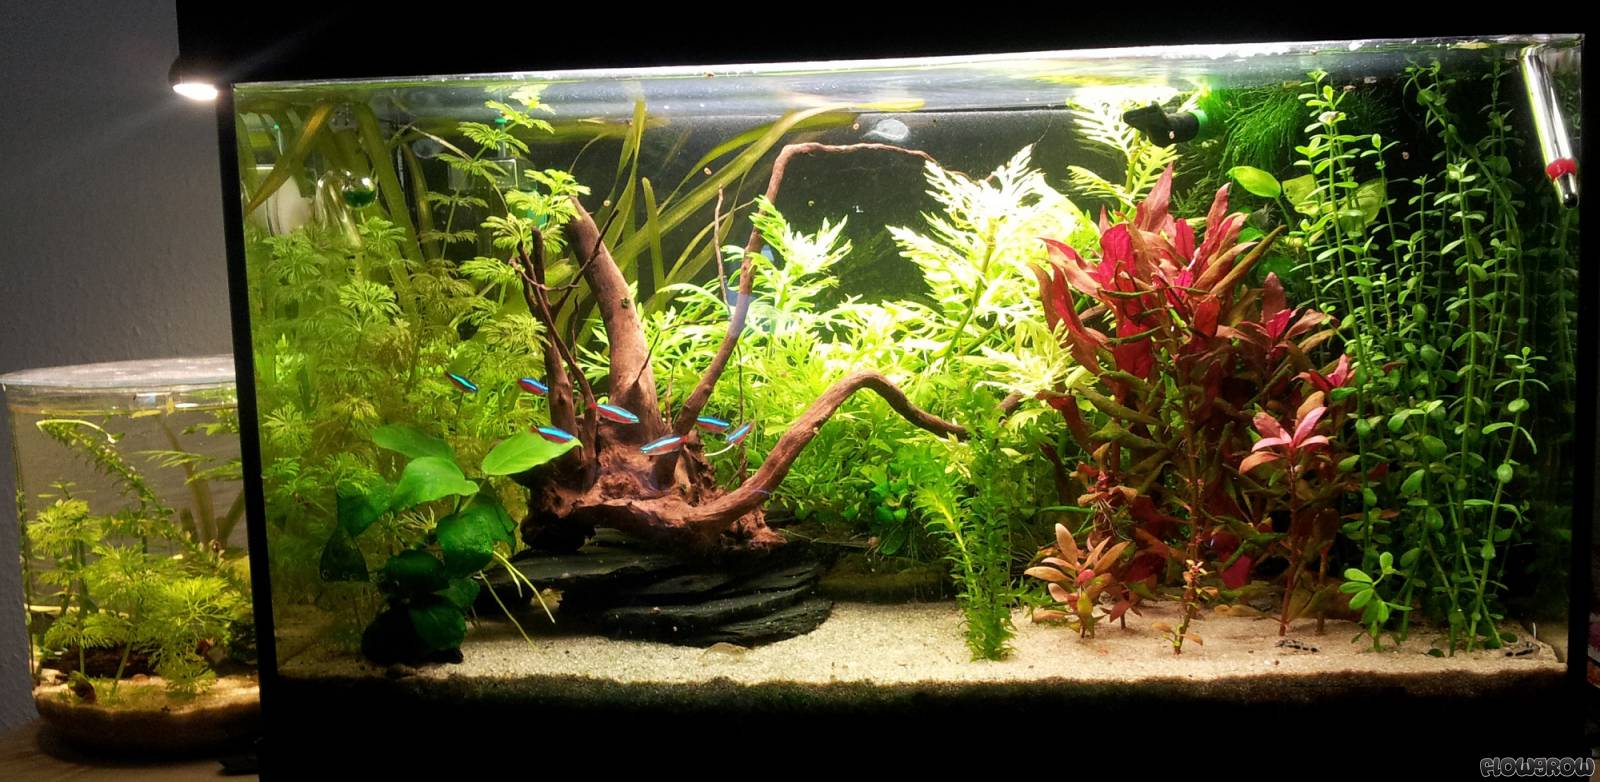 Flowgrow aquascaping aquarium wasserpflanzen for Aquarium im kinderzimmer